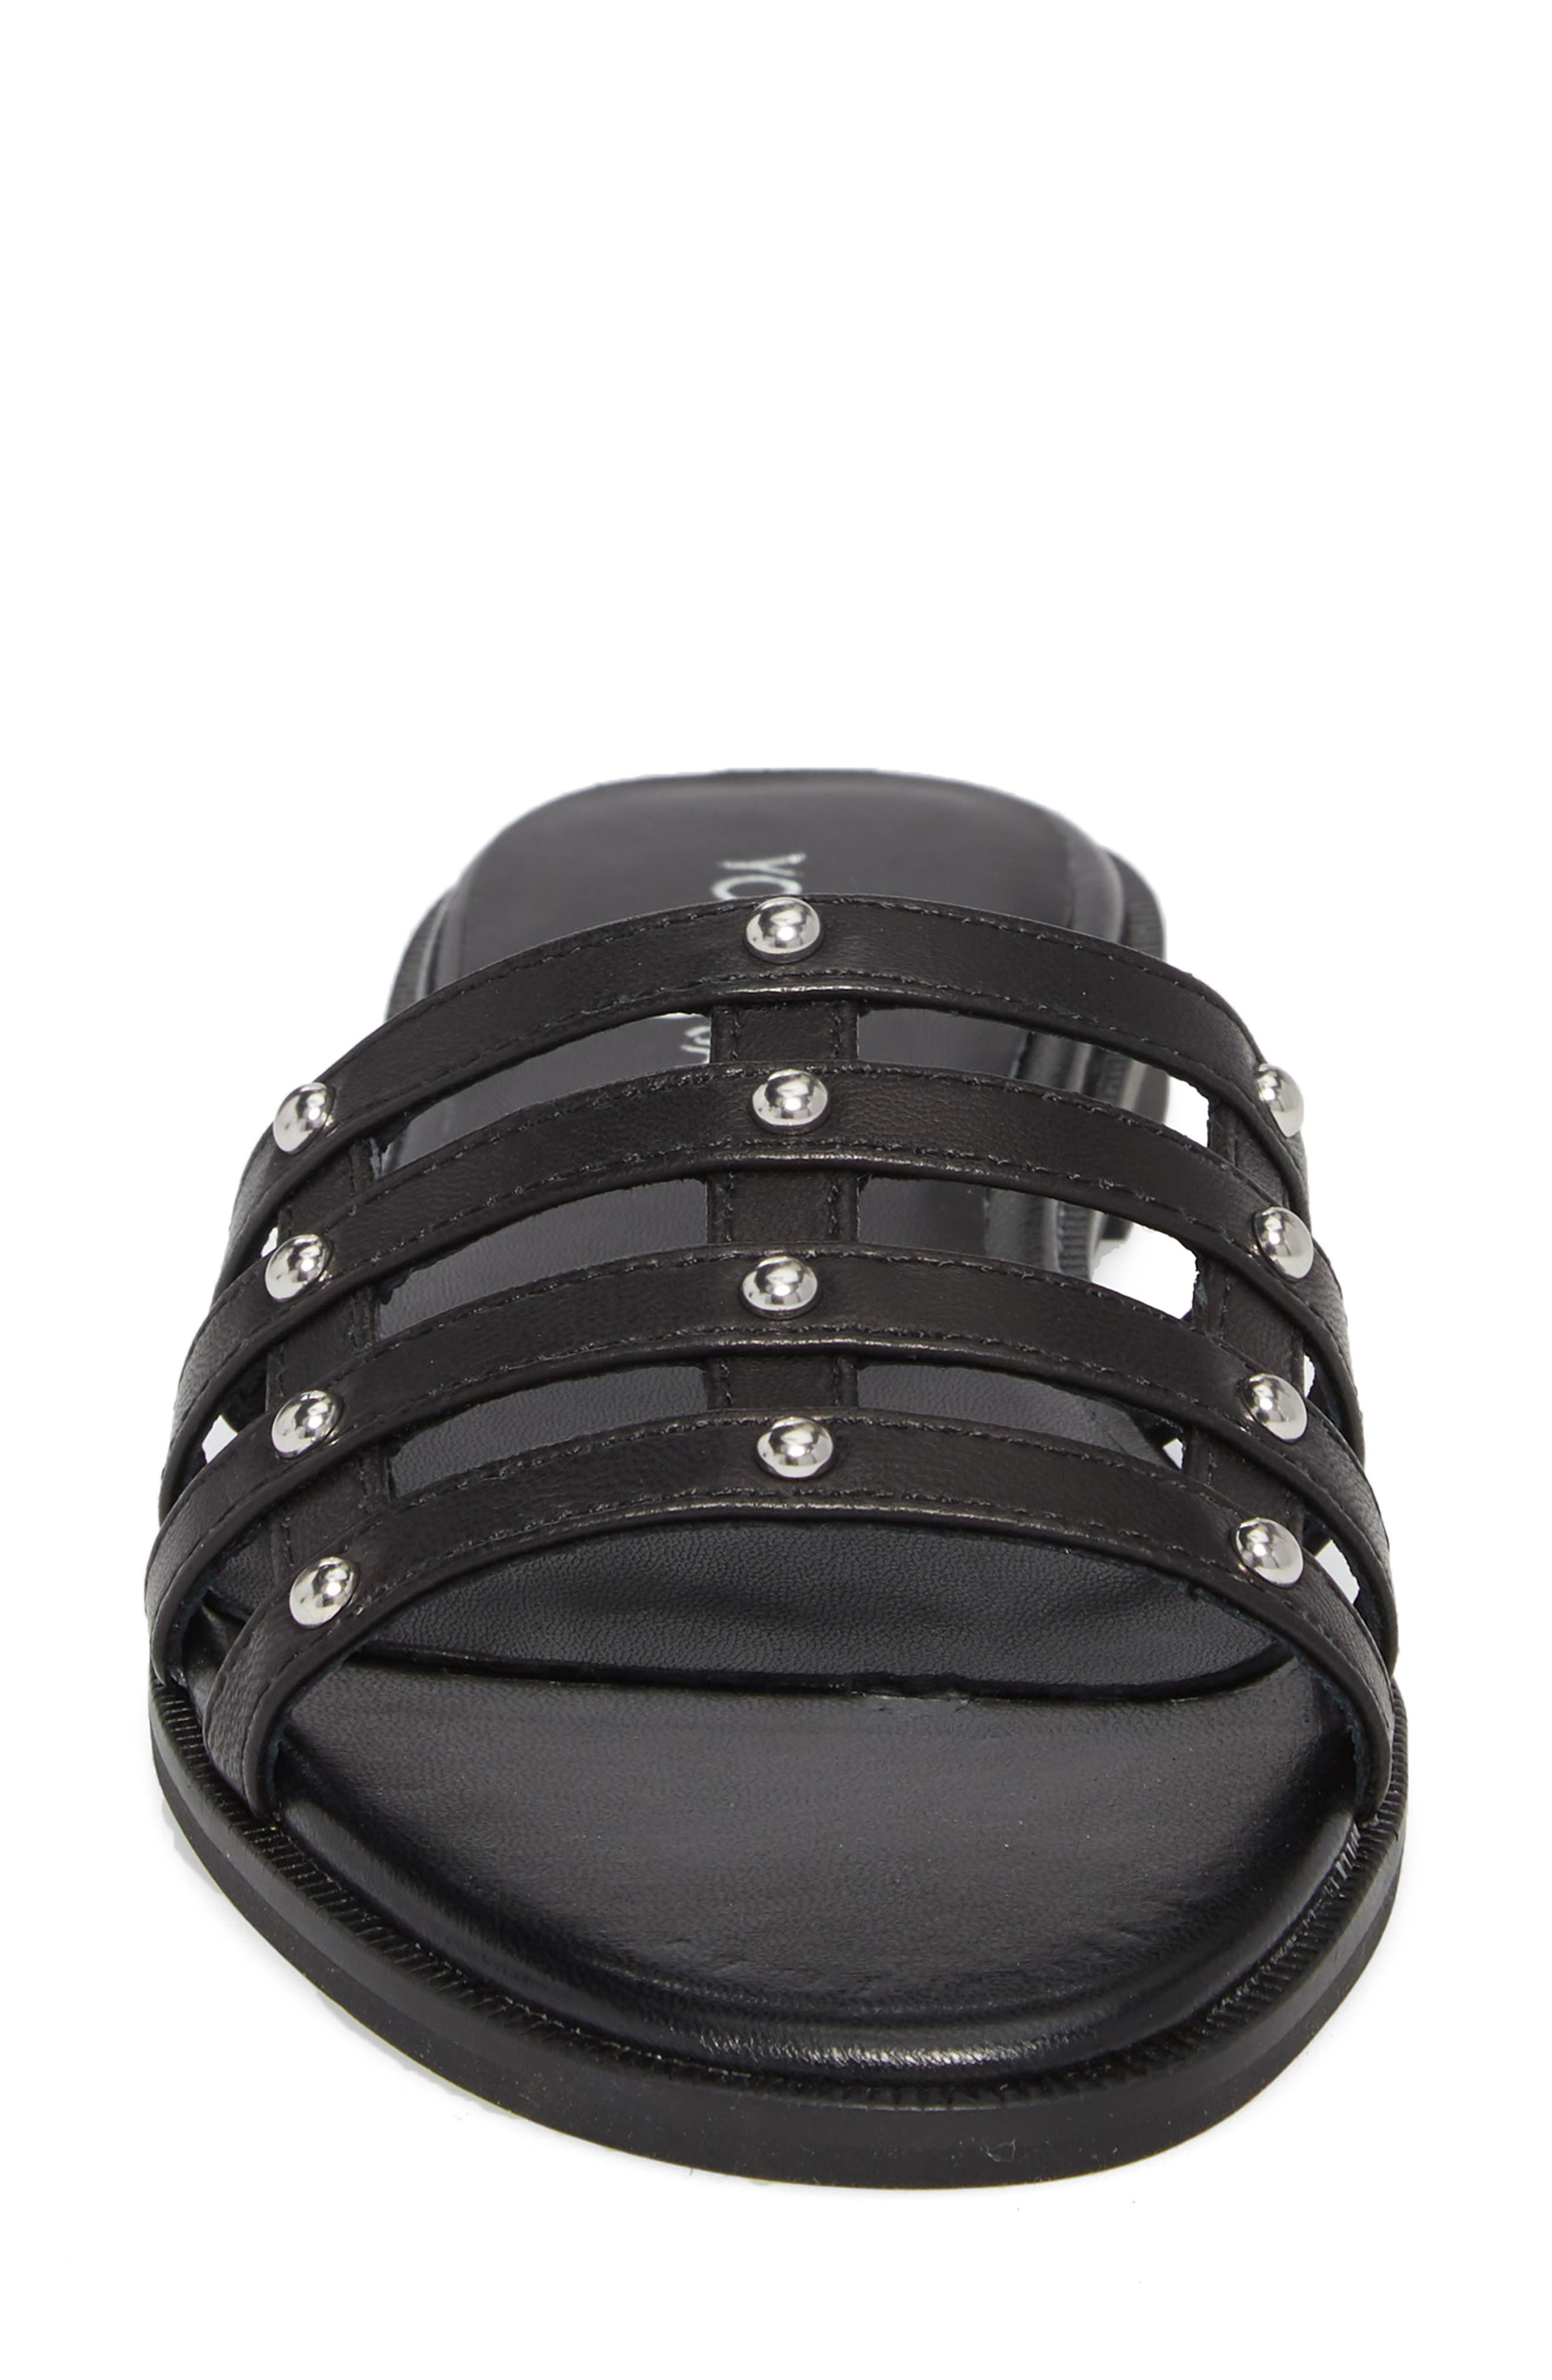 Cara Slide Sandal,                             Alternate thumbnail 4, color,                             Black/ Silver Studs